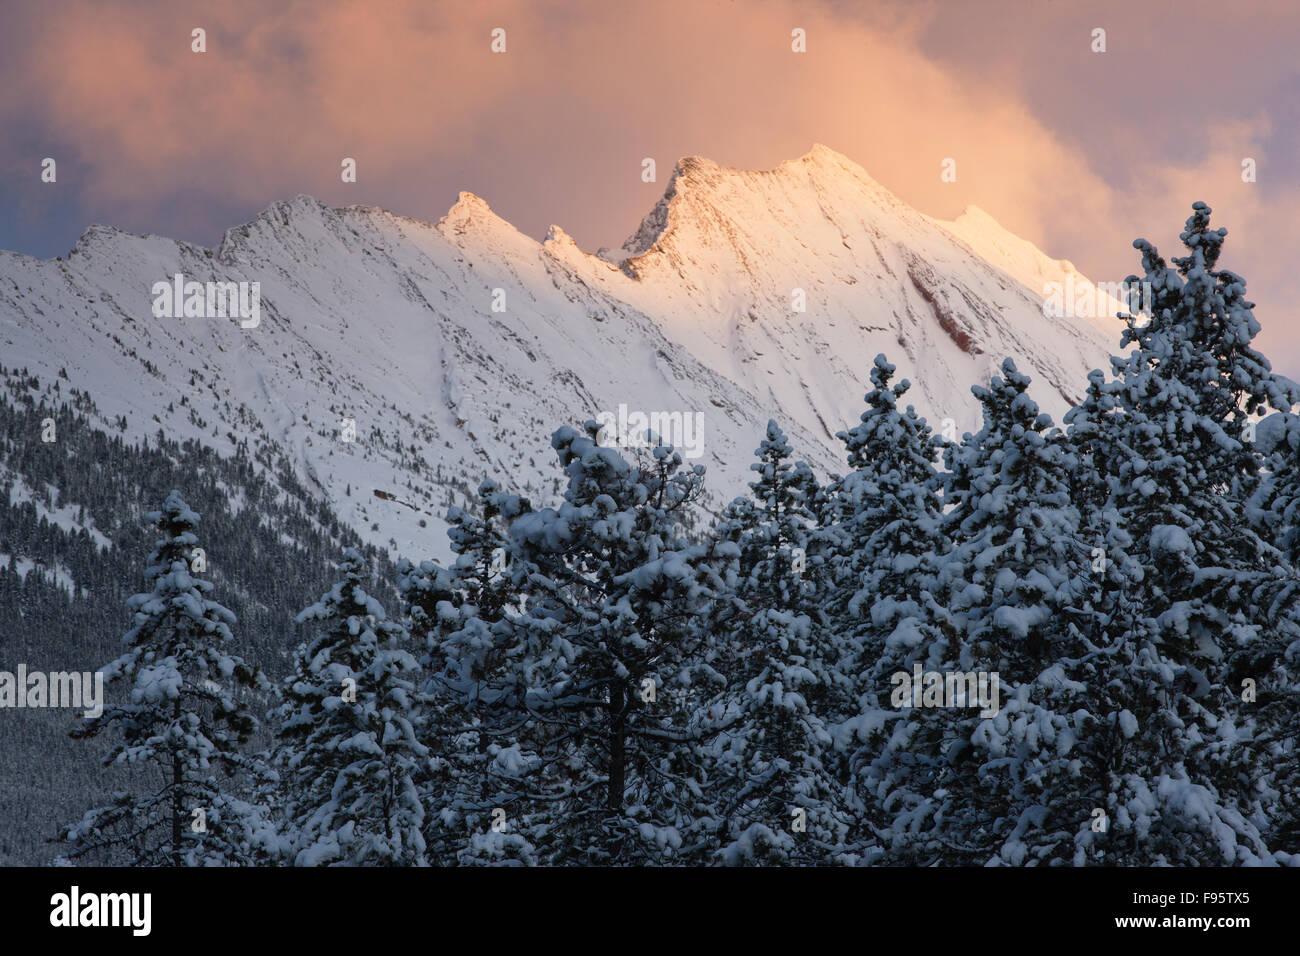 The Endless Chain Ridge at dusk, Jasper National Park, Alberta, Canada - Stock Image